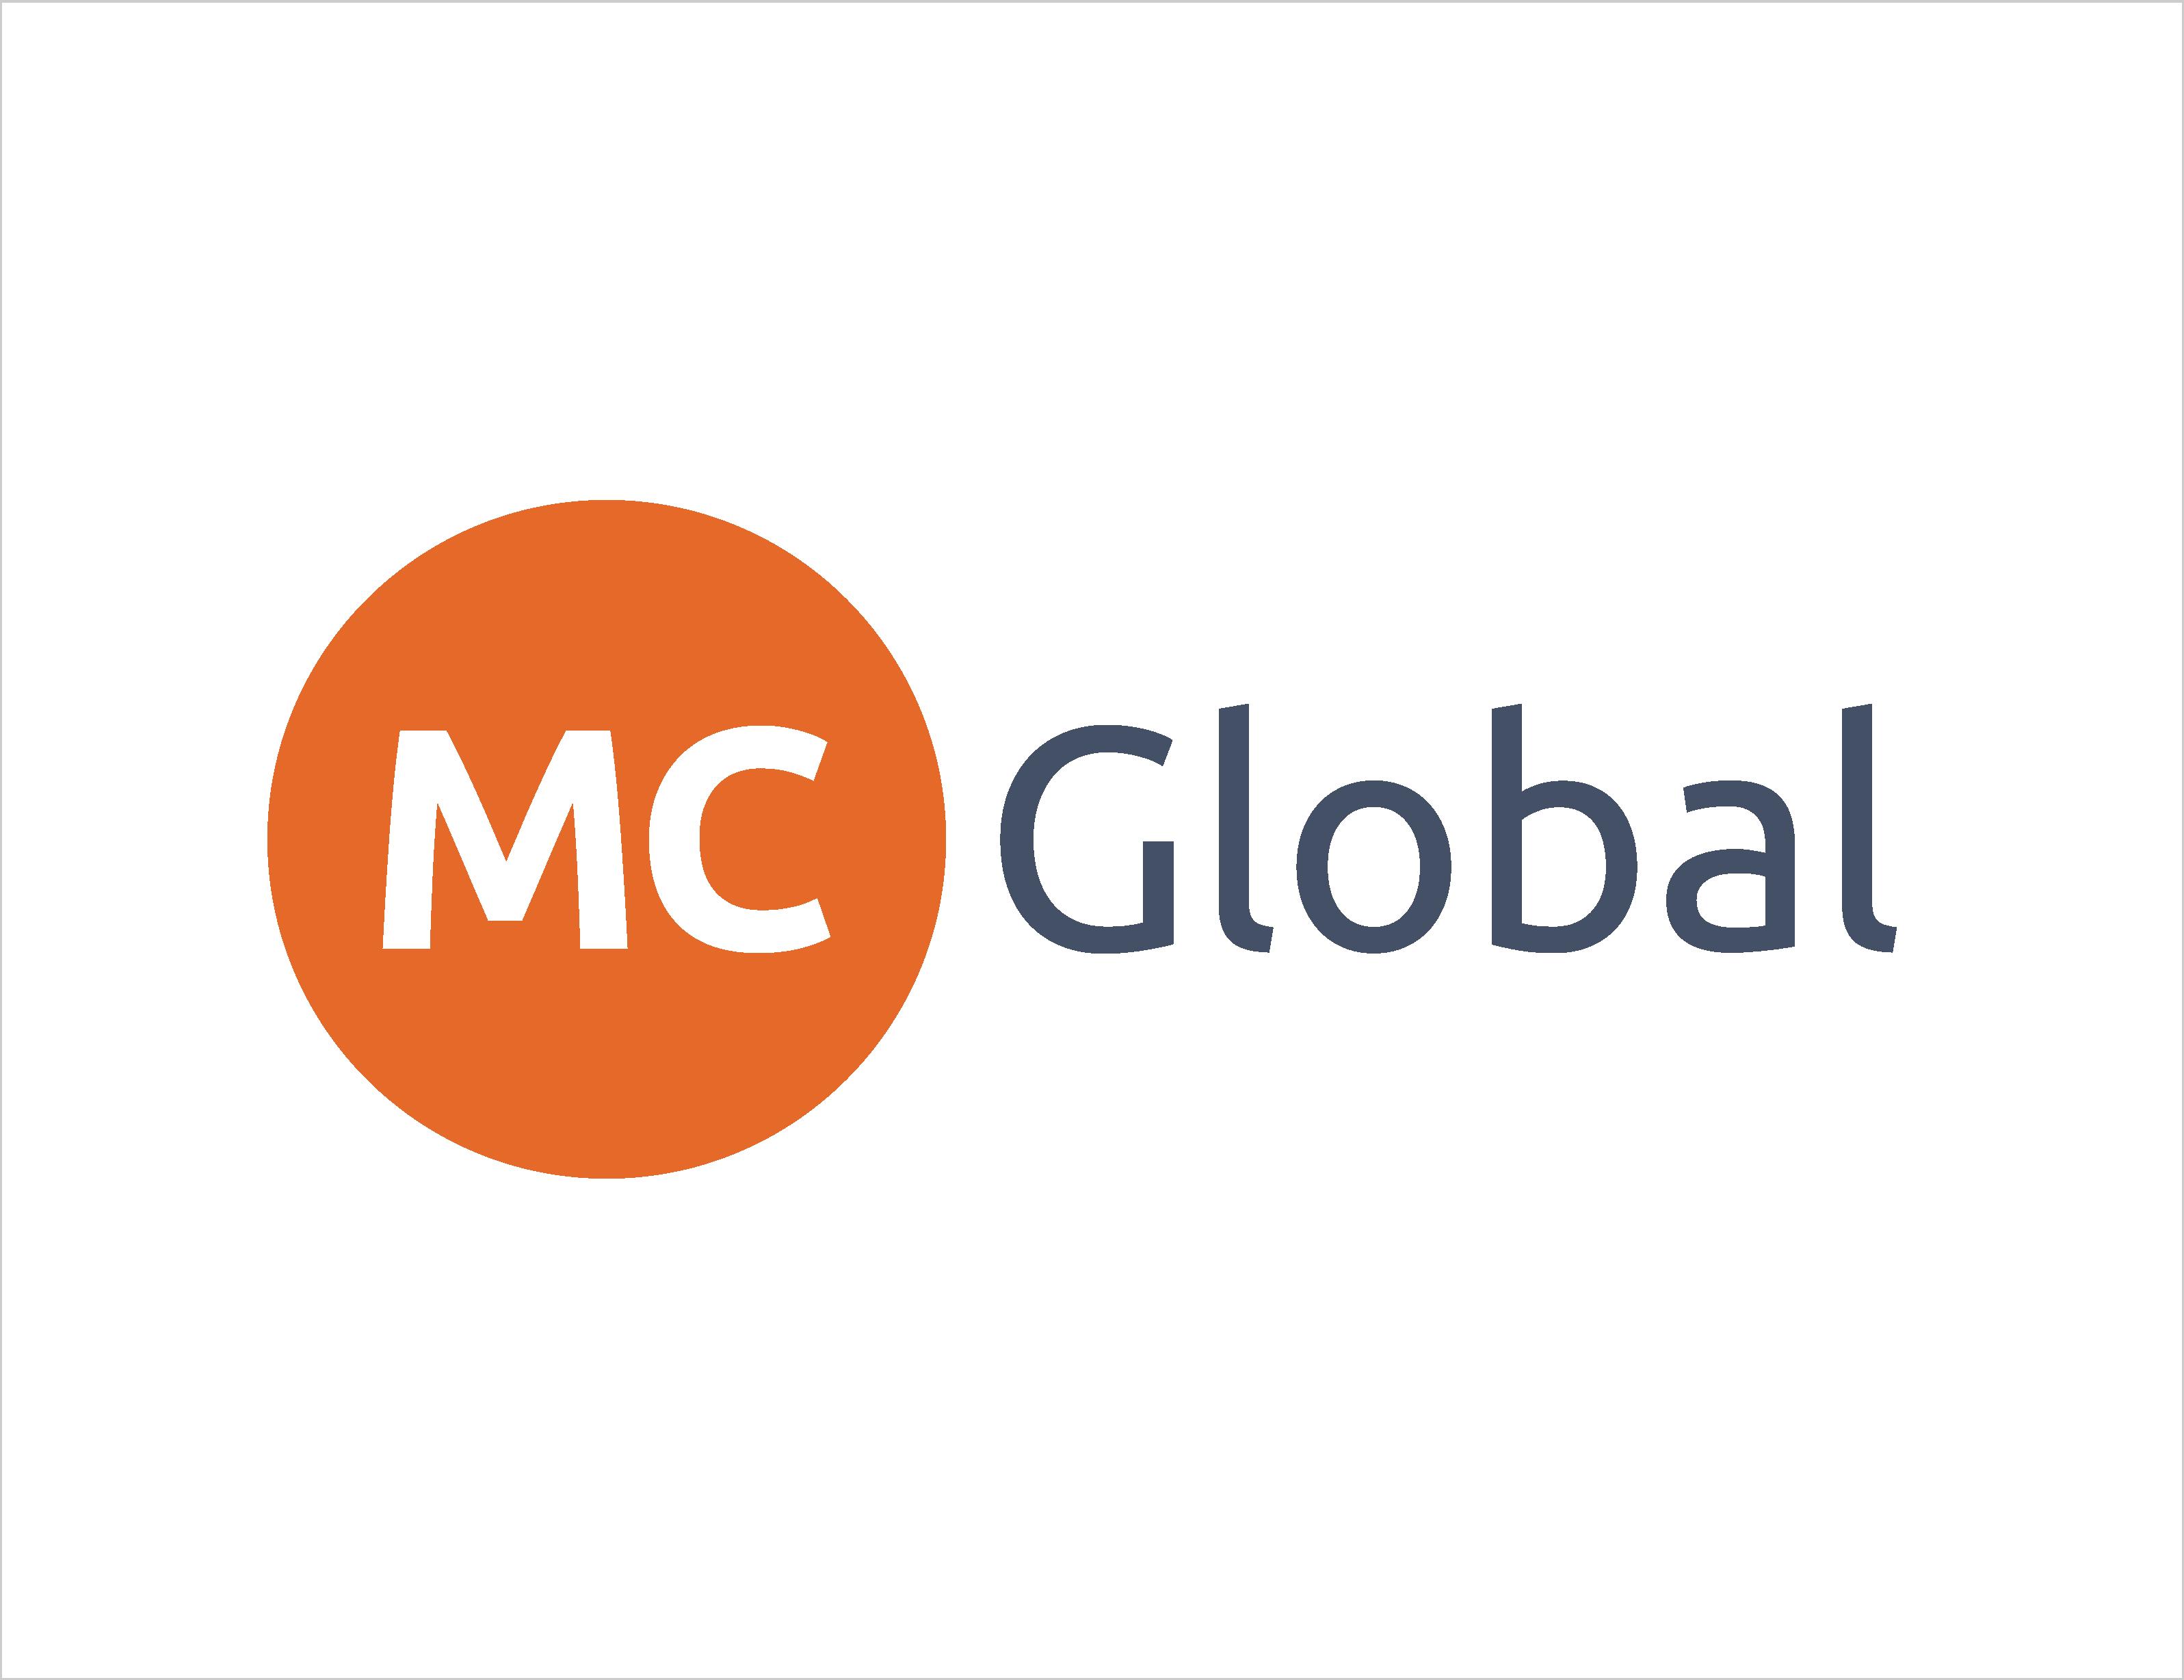 mc global 1